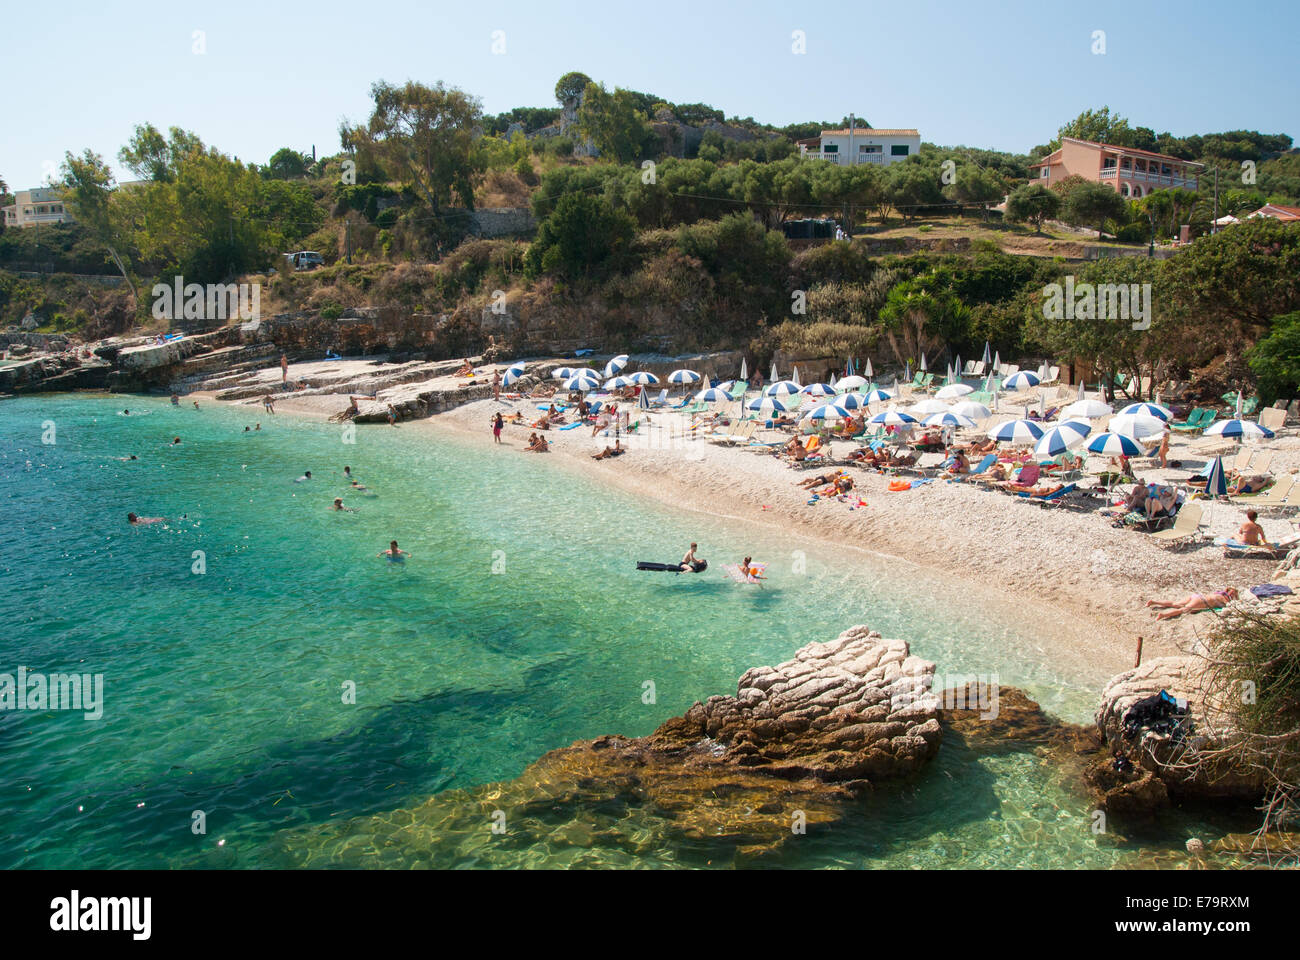 Kassiopi Beach, Corfu Island, Ionian Sea, Greece. - Stock Image